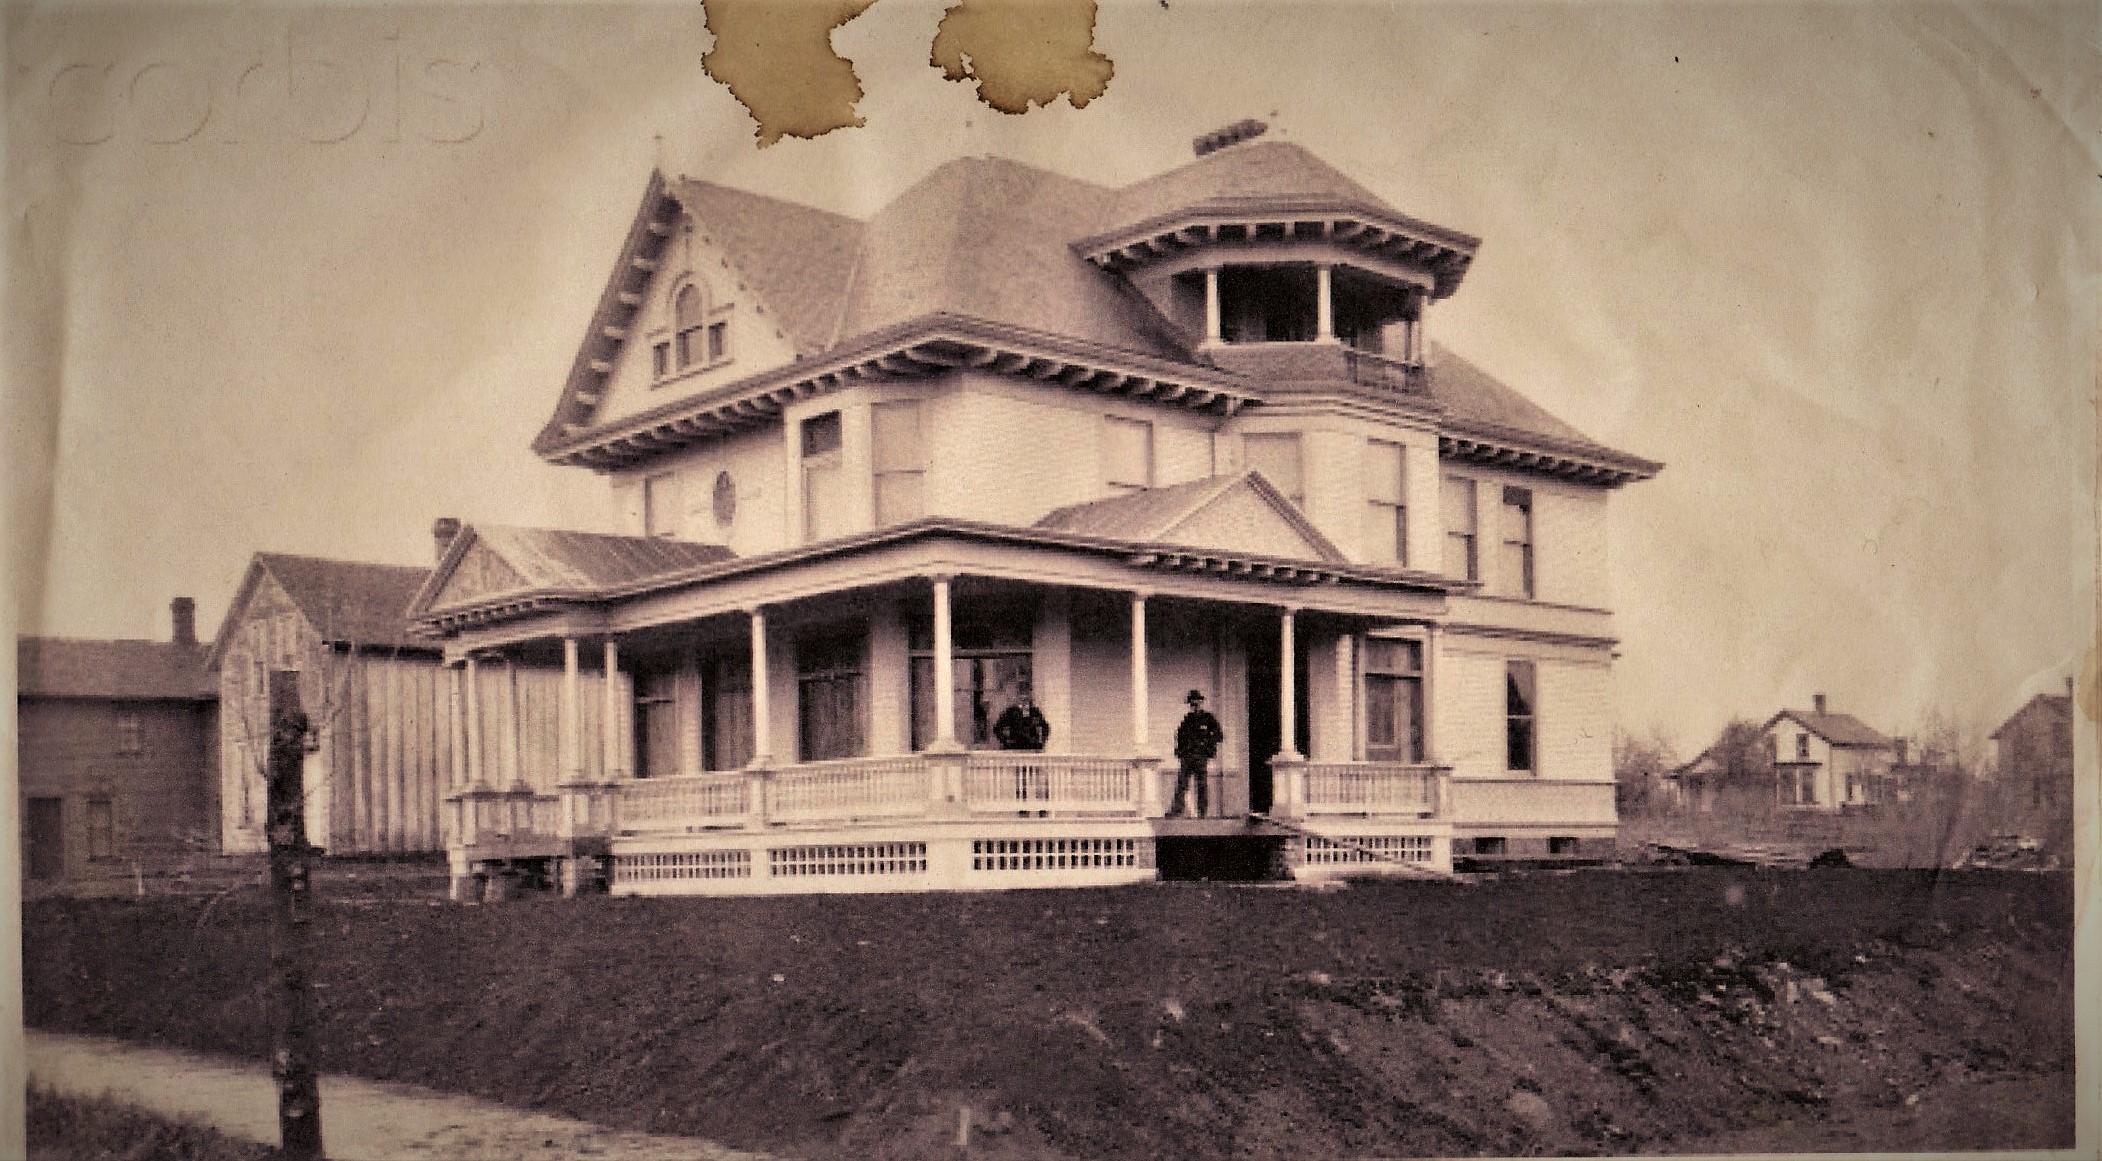 Historic photo of Kinzler House